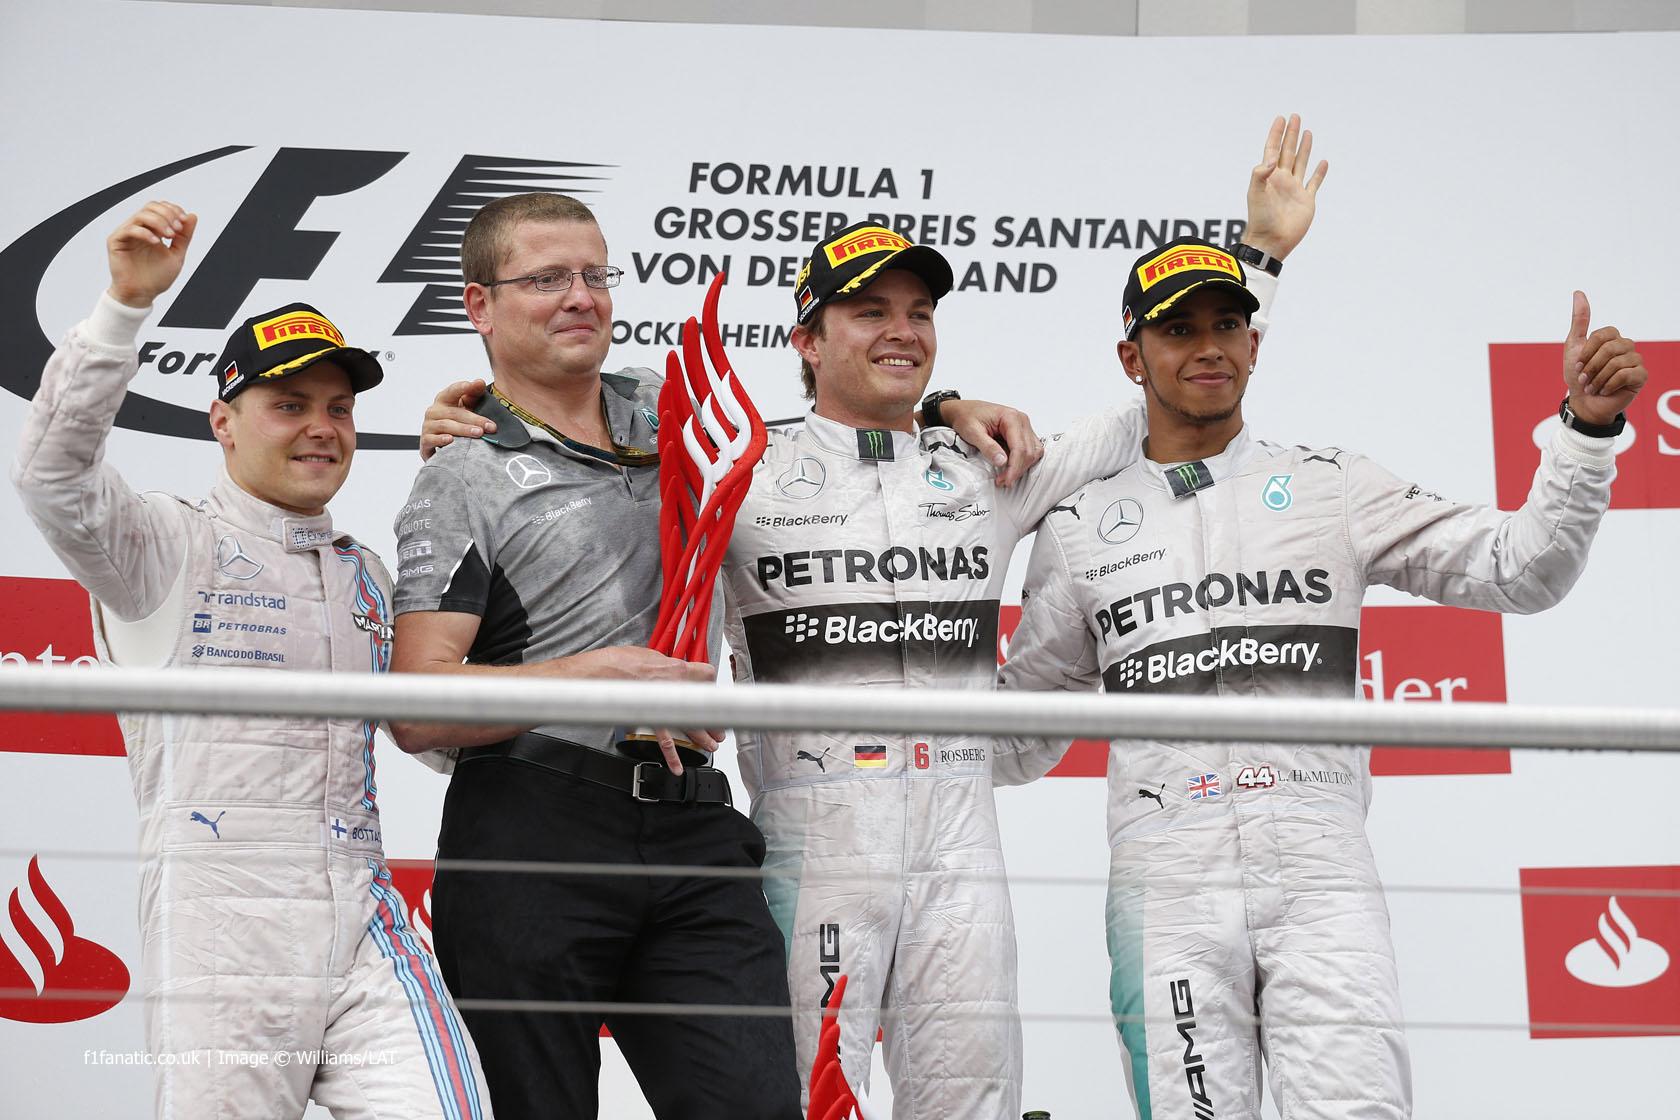 Valtteri Bottas, Nico Rosberg, Lewis Hamilton, Hockenheimring, 2014